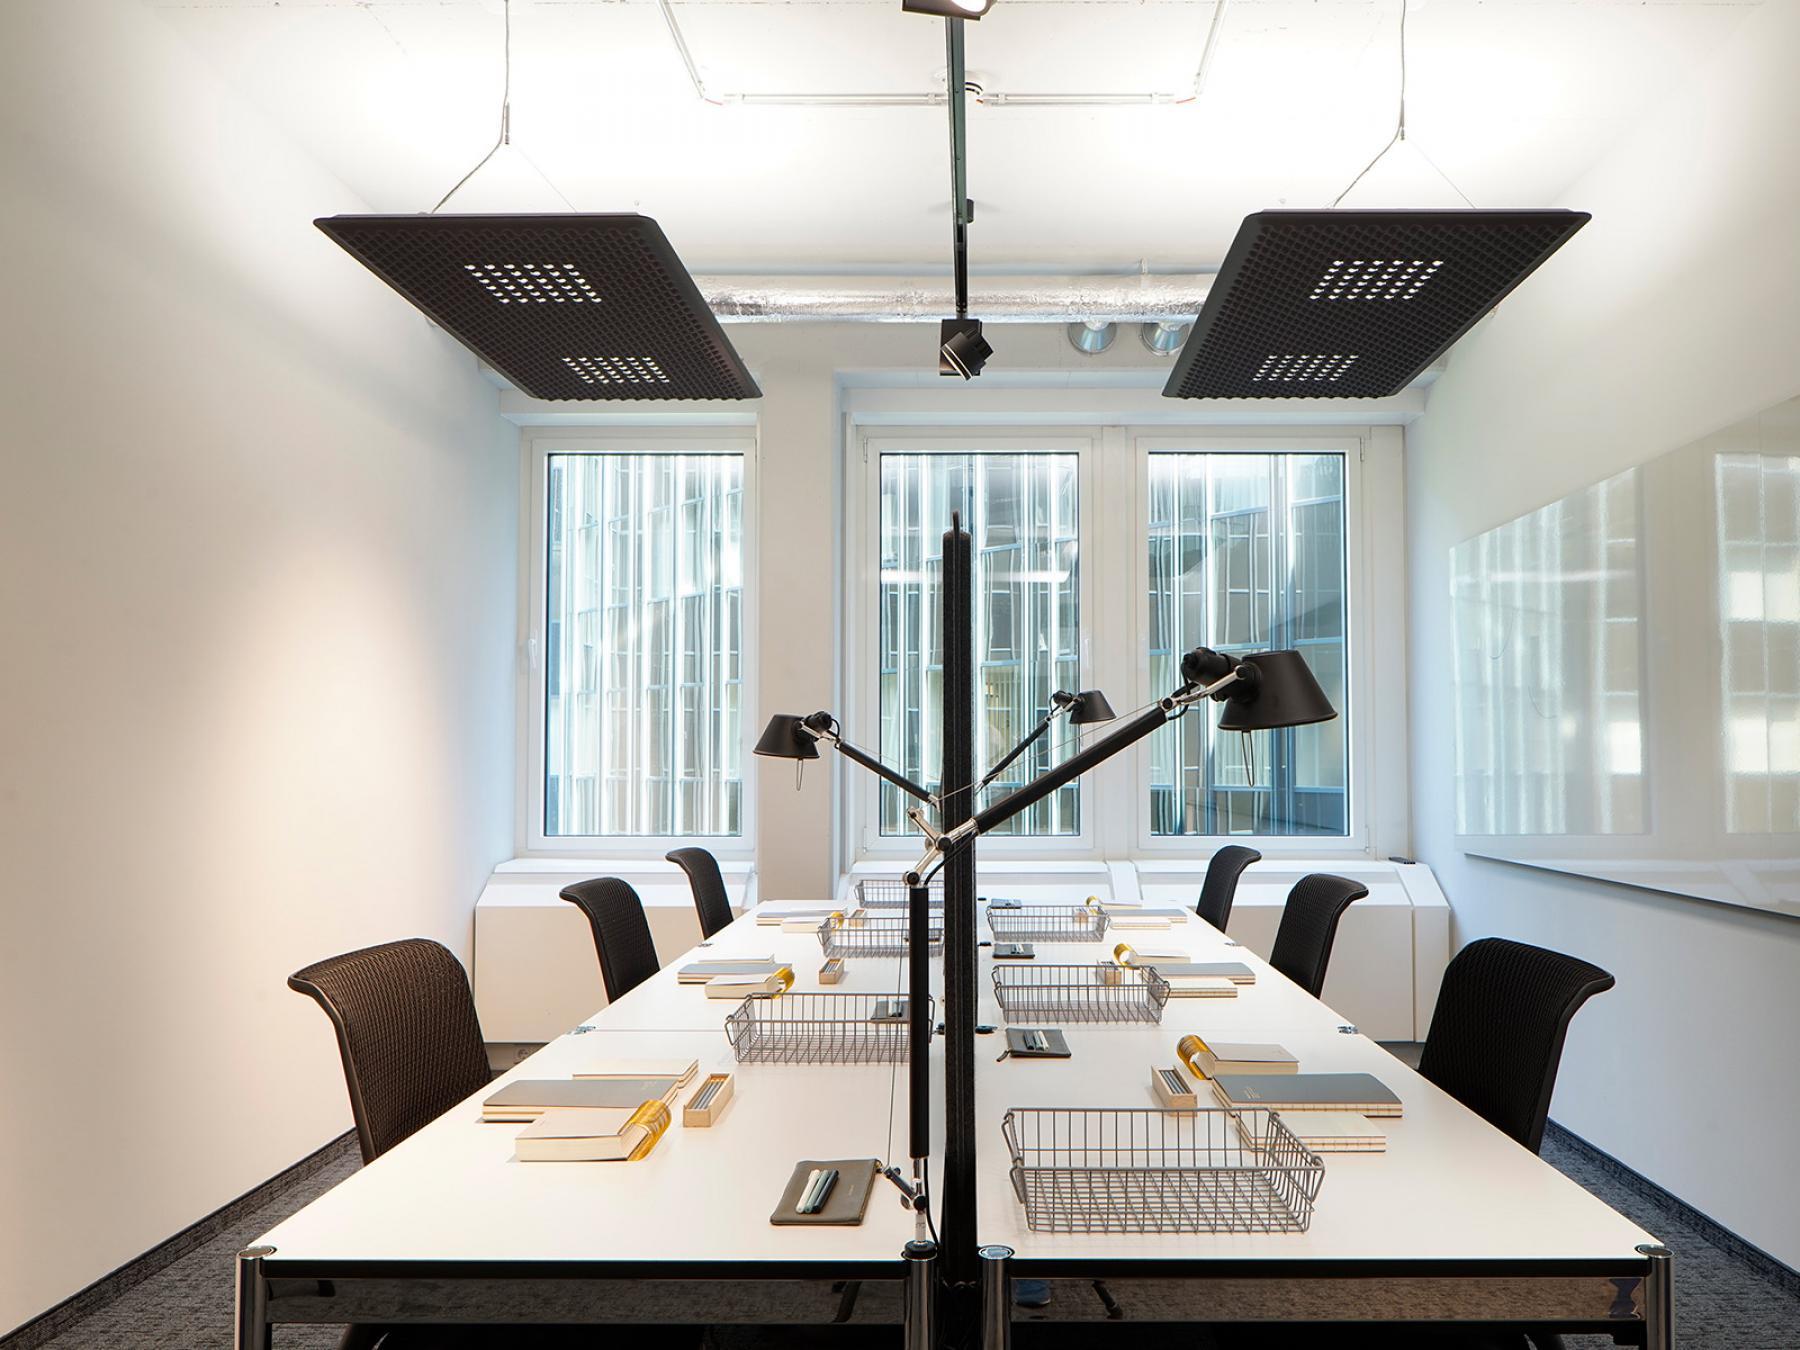 Moderne Arbeitsplätze in hellem Großraumbüro